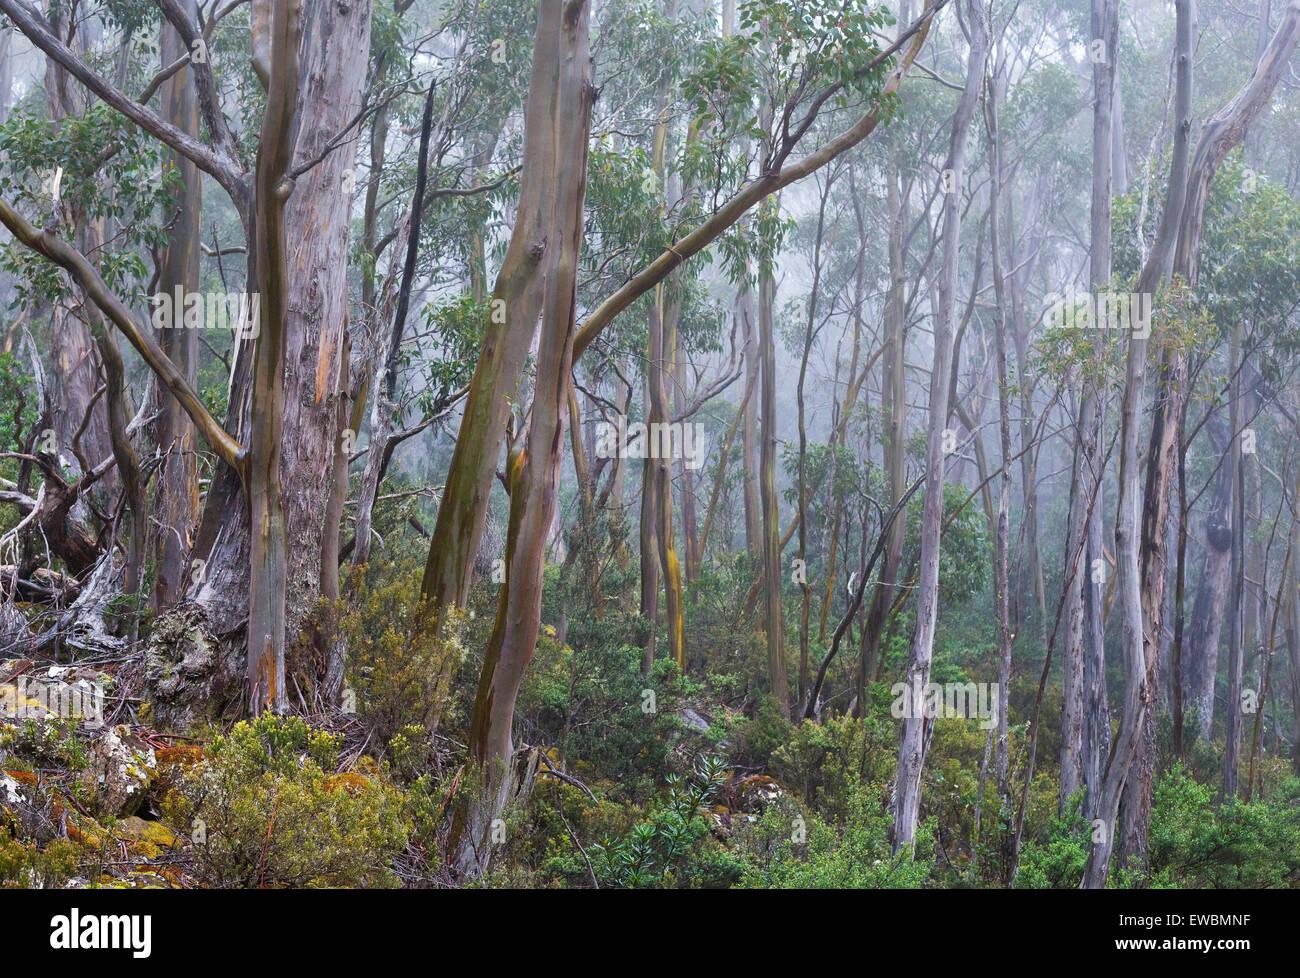 Alpine Yellow Gums (Eucalyptus subcrenulata) in a subalpine woodland in Mount Field National Park, Tasmania, Australia - Stock Image